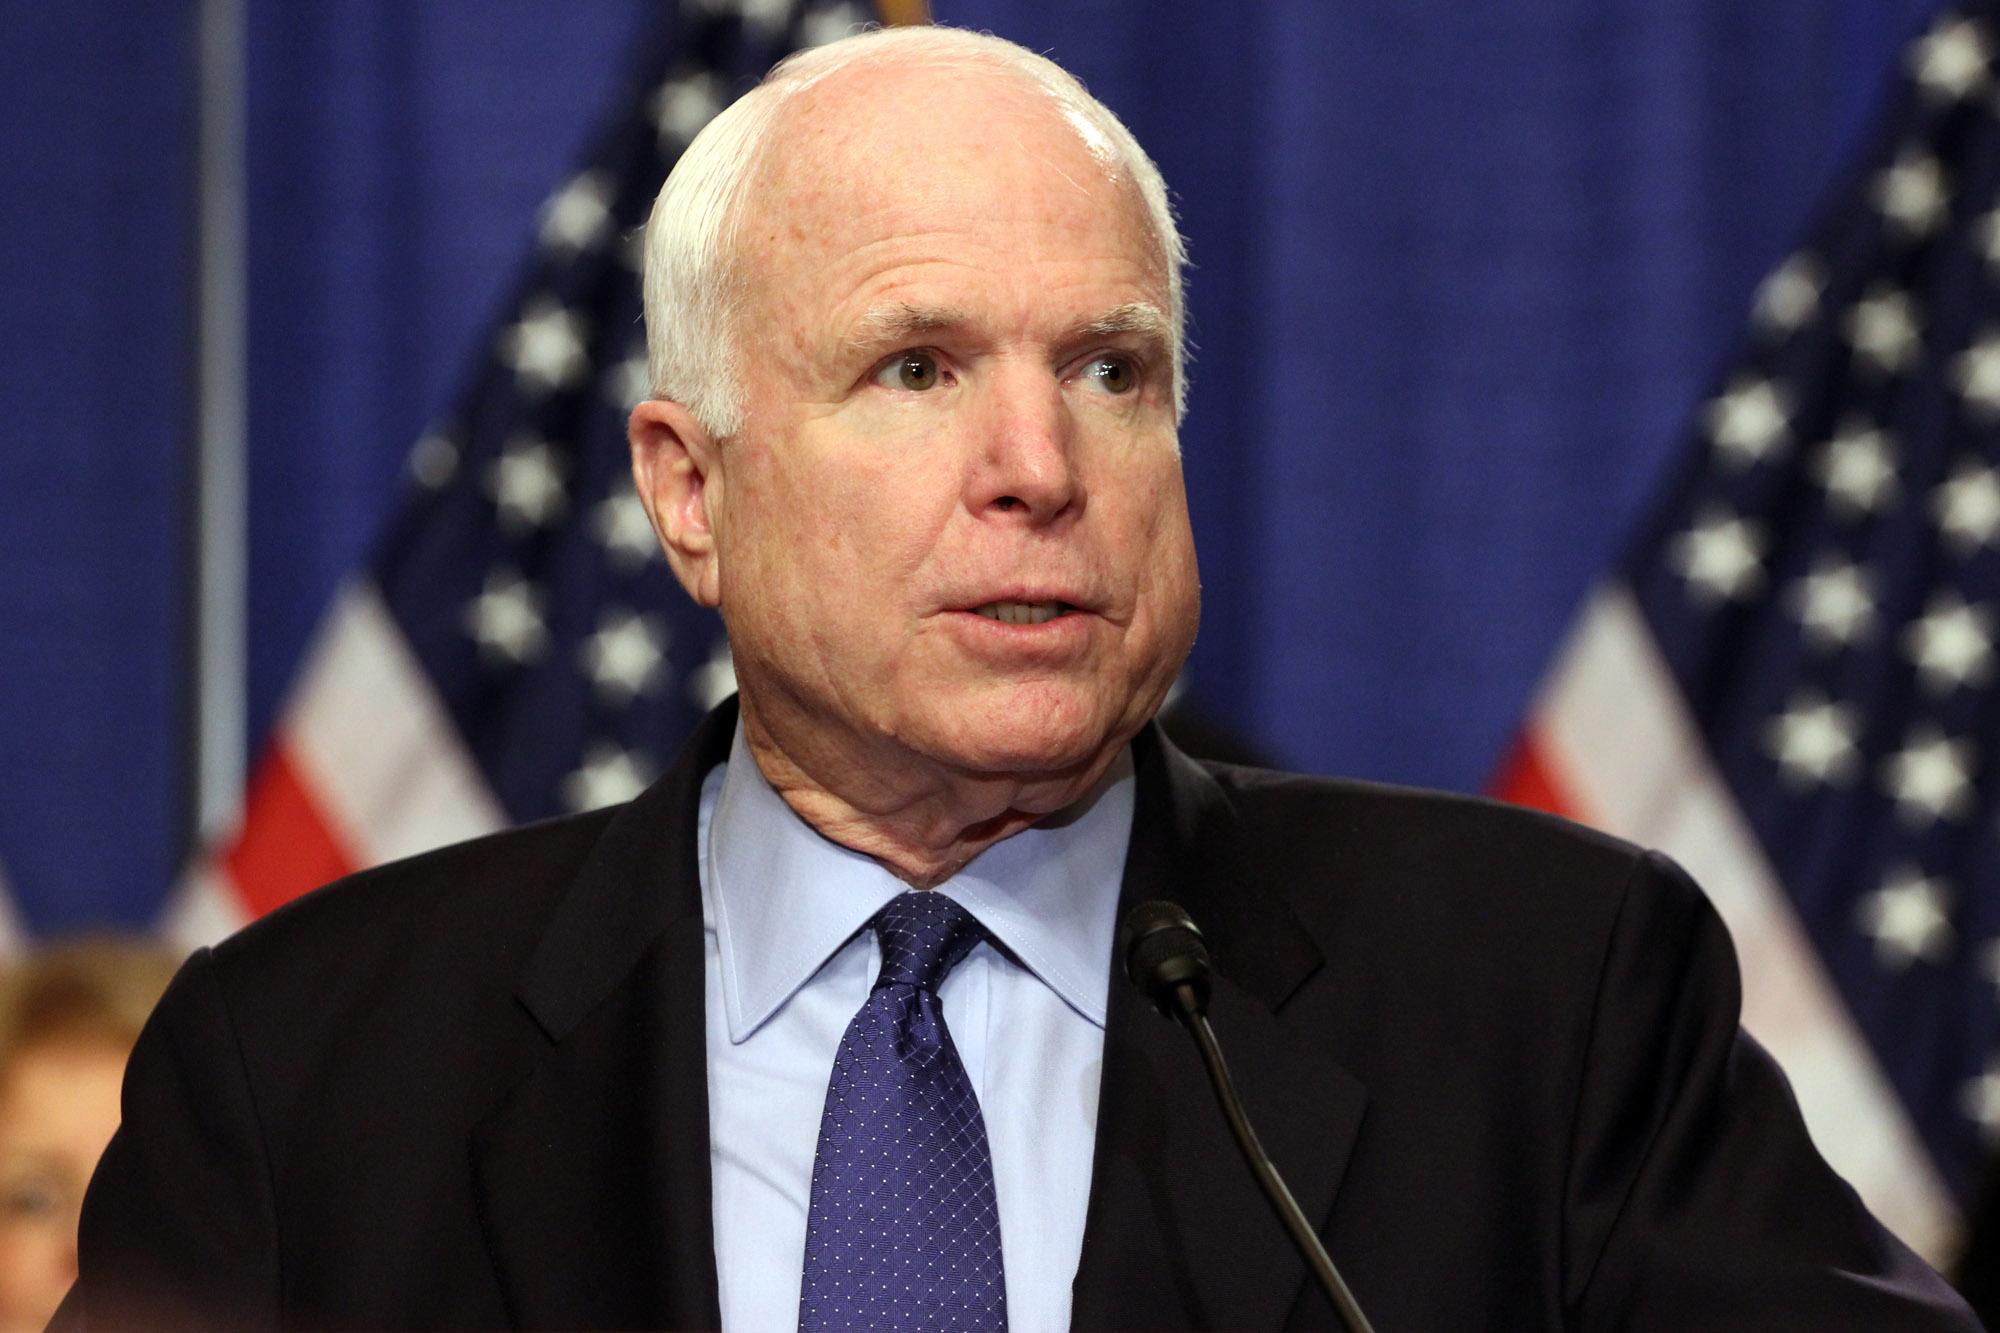 mccain - Sen. McCain slams Trump's announcement of transgender ban